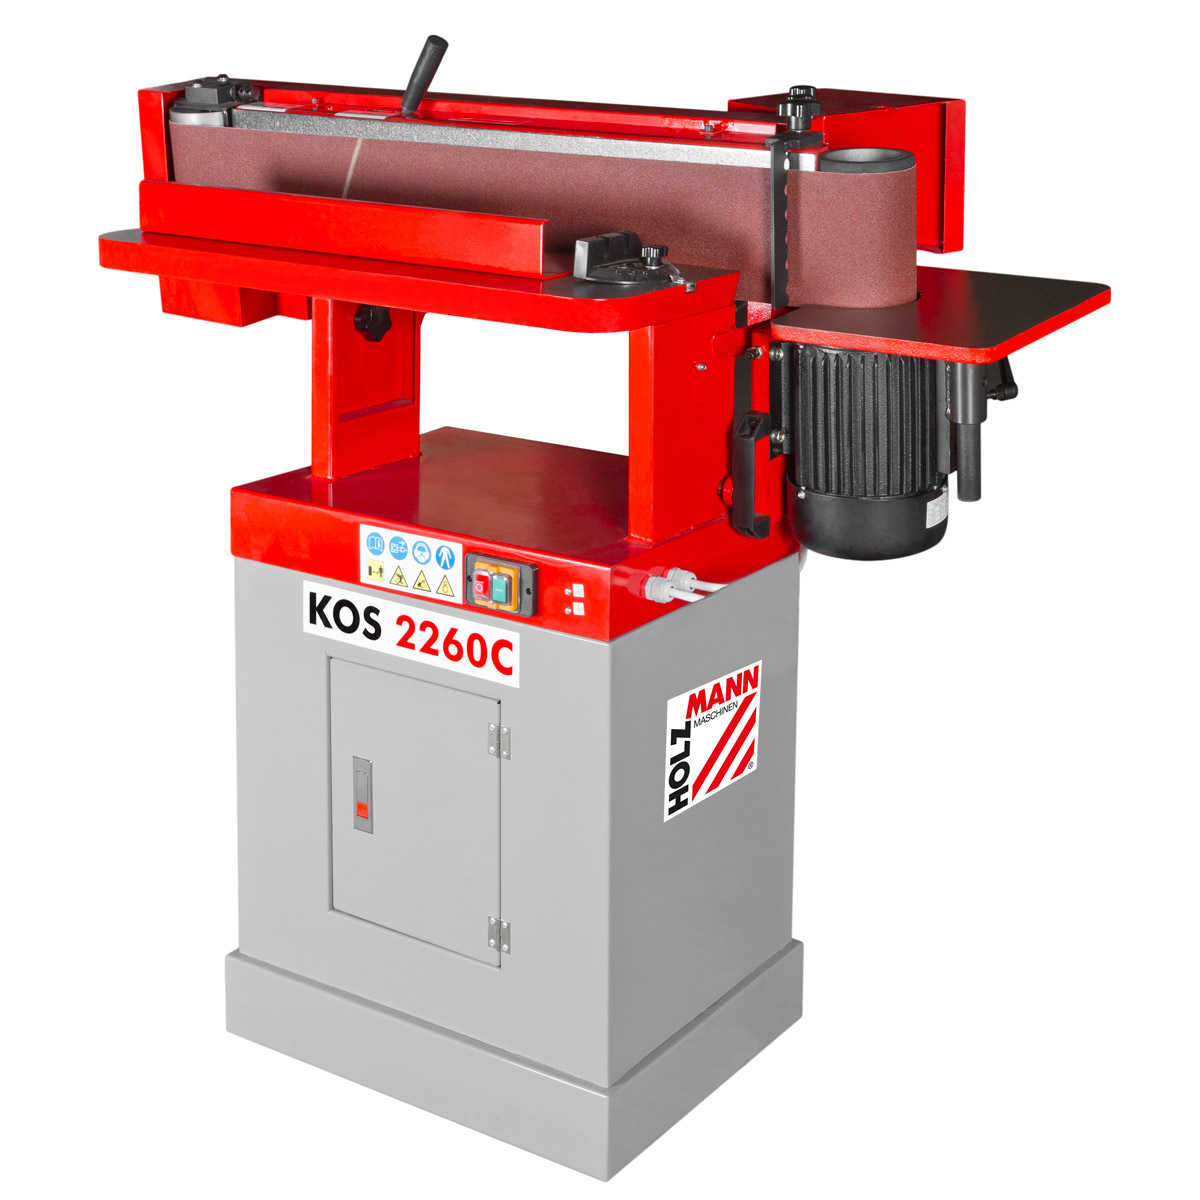 HOLZMANN Kantenschleifmaschine KS 2000 230V